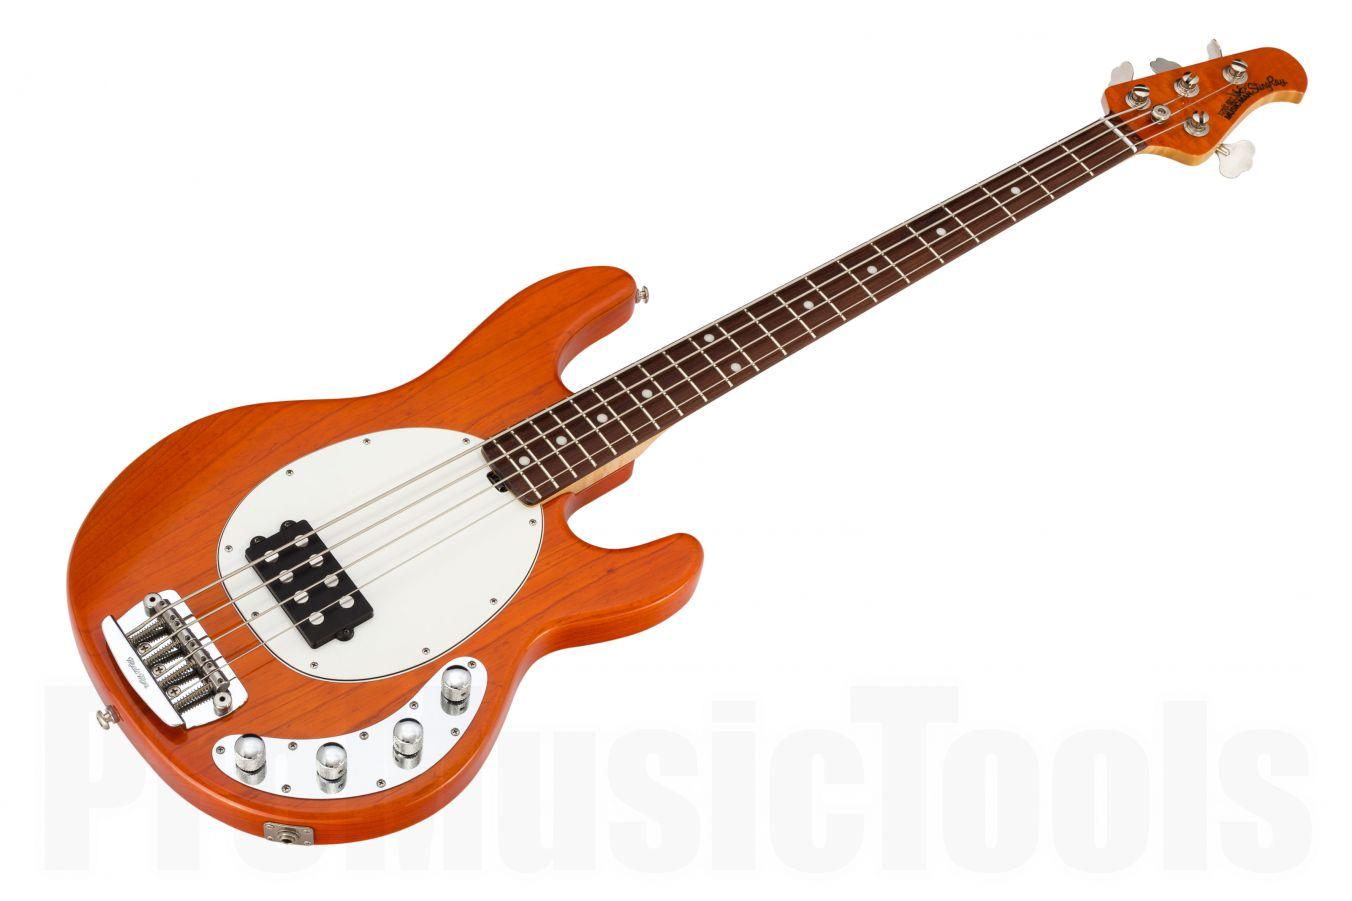 Music Man USA Stingray 4 TO - Translucent Orange RW MH Birdseye